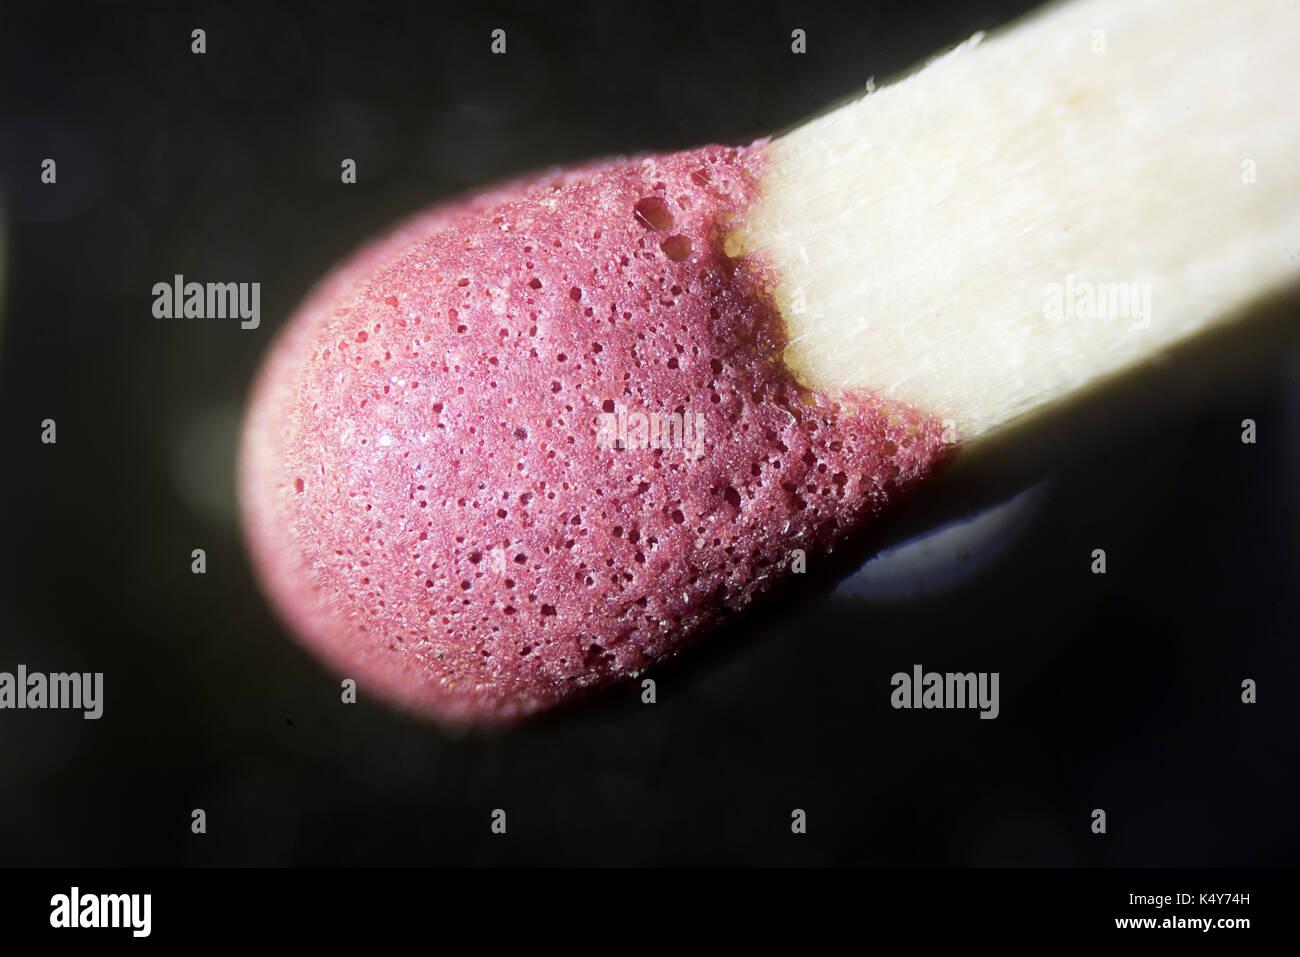 The Microscopic World. Match head under the microscope - Stock Image